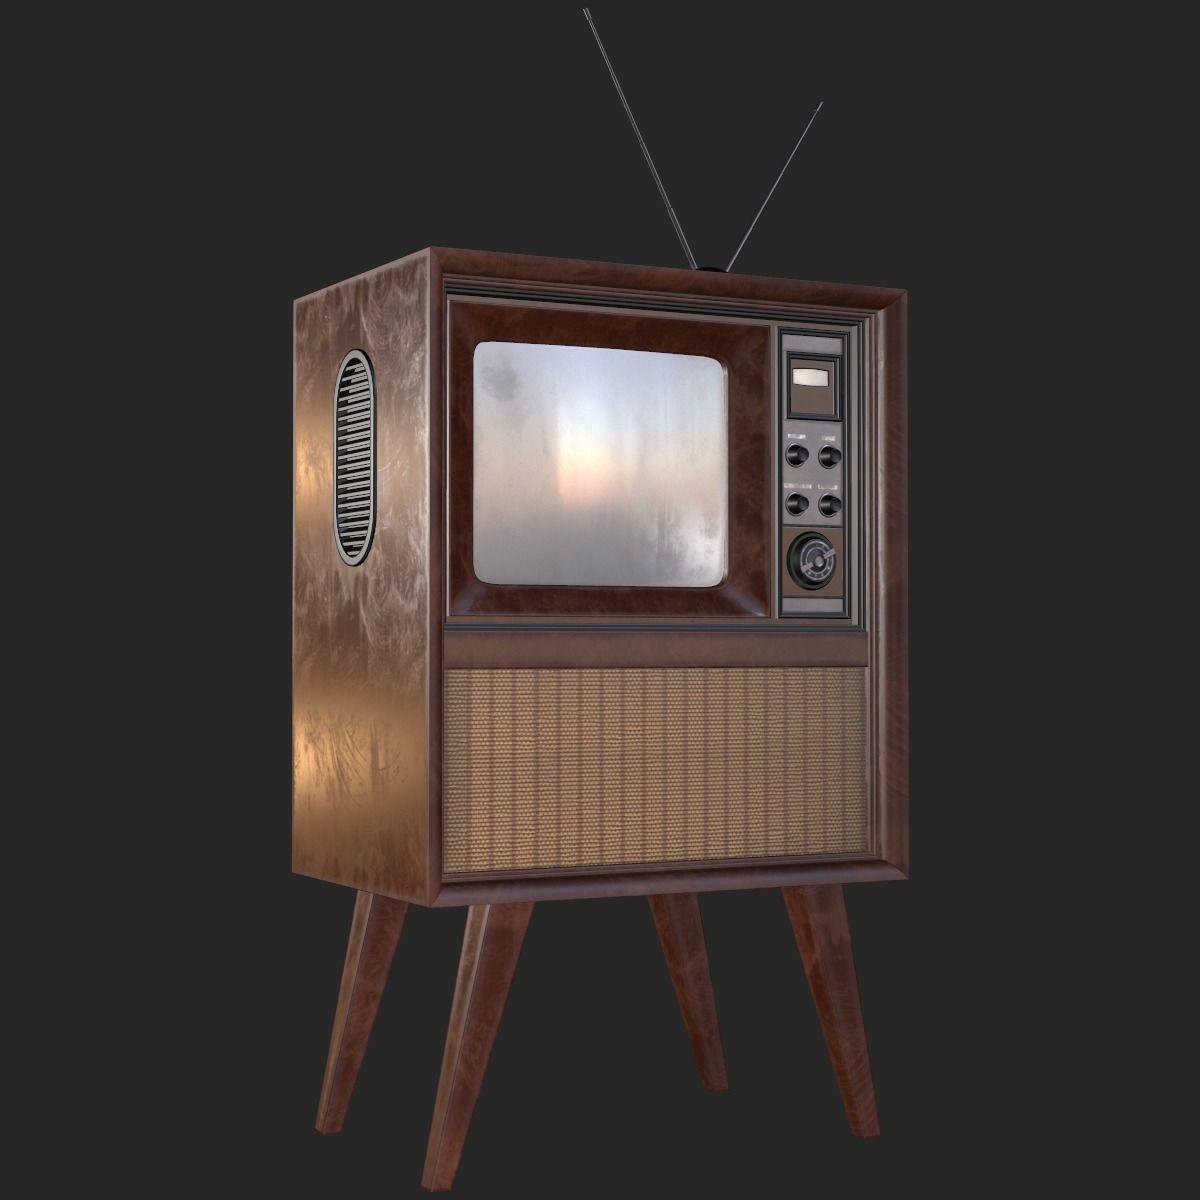 Retro Vintage TV PBR